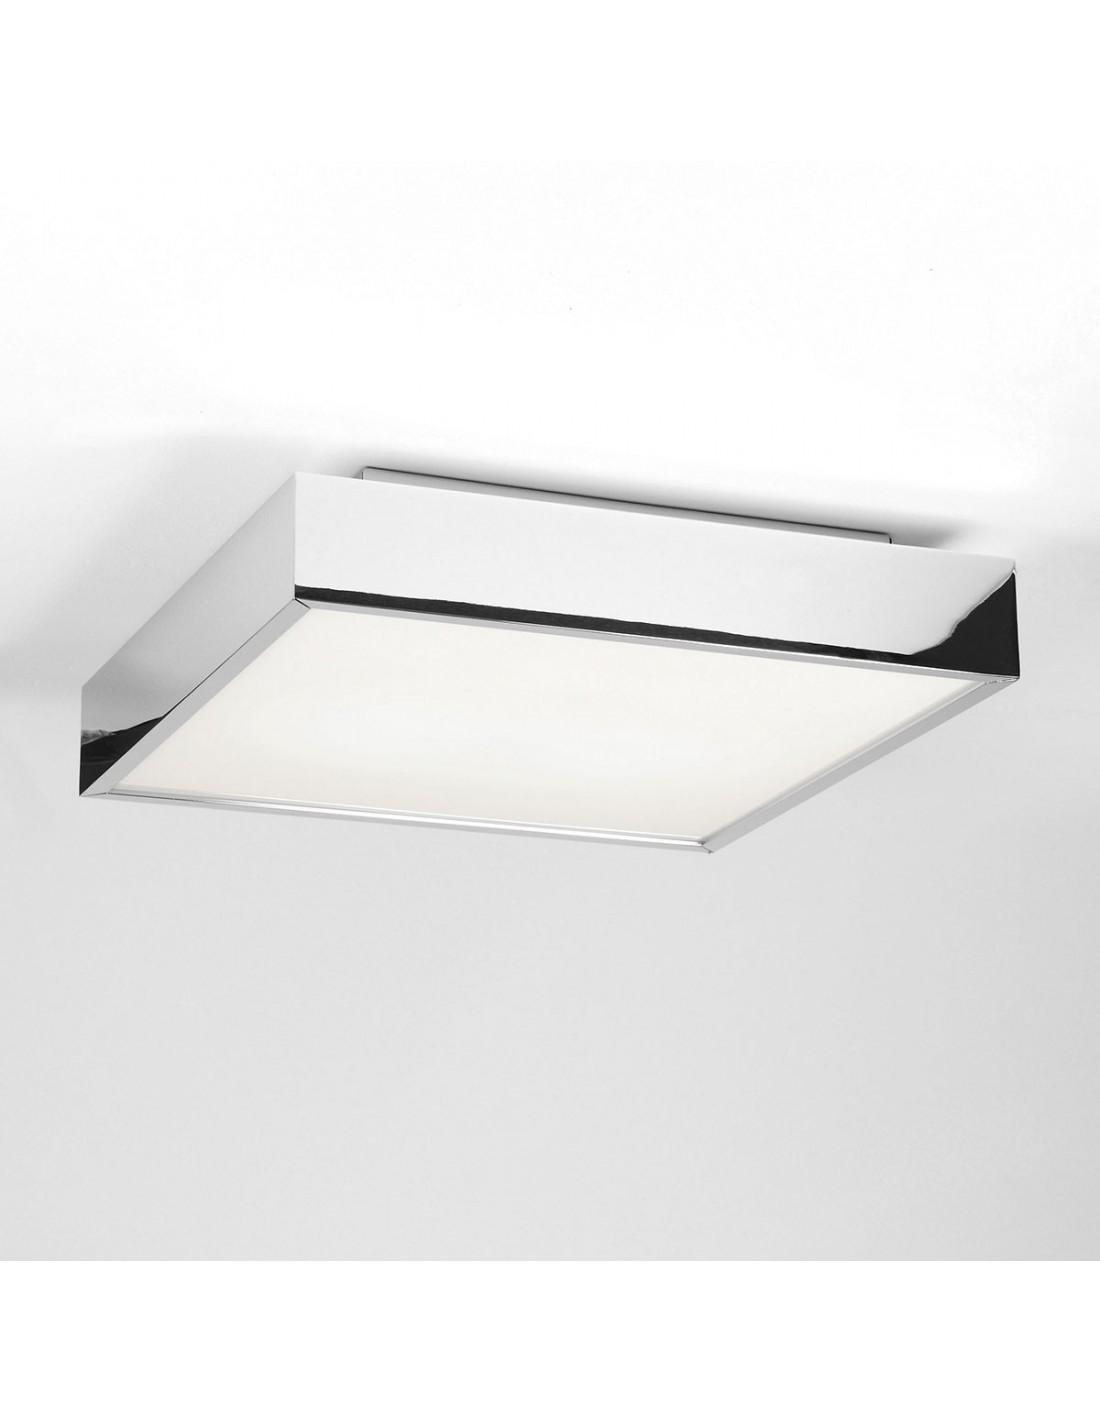 Plafonnier Taketa square LED chrome astro lighting